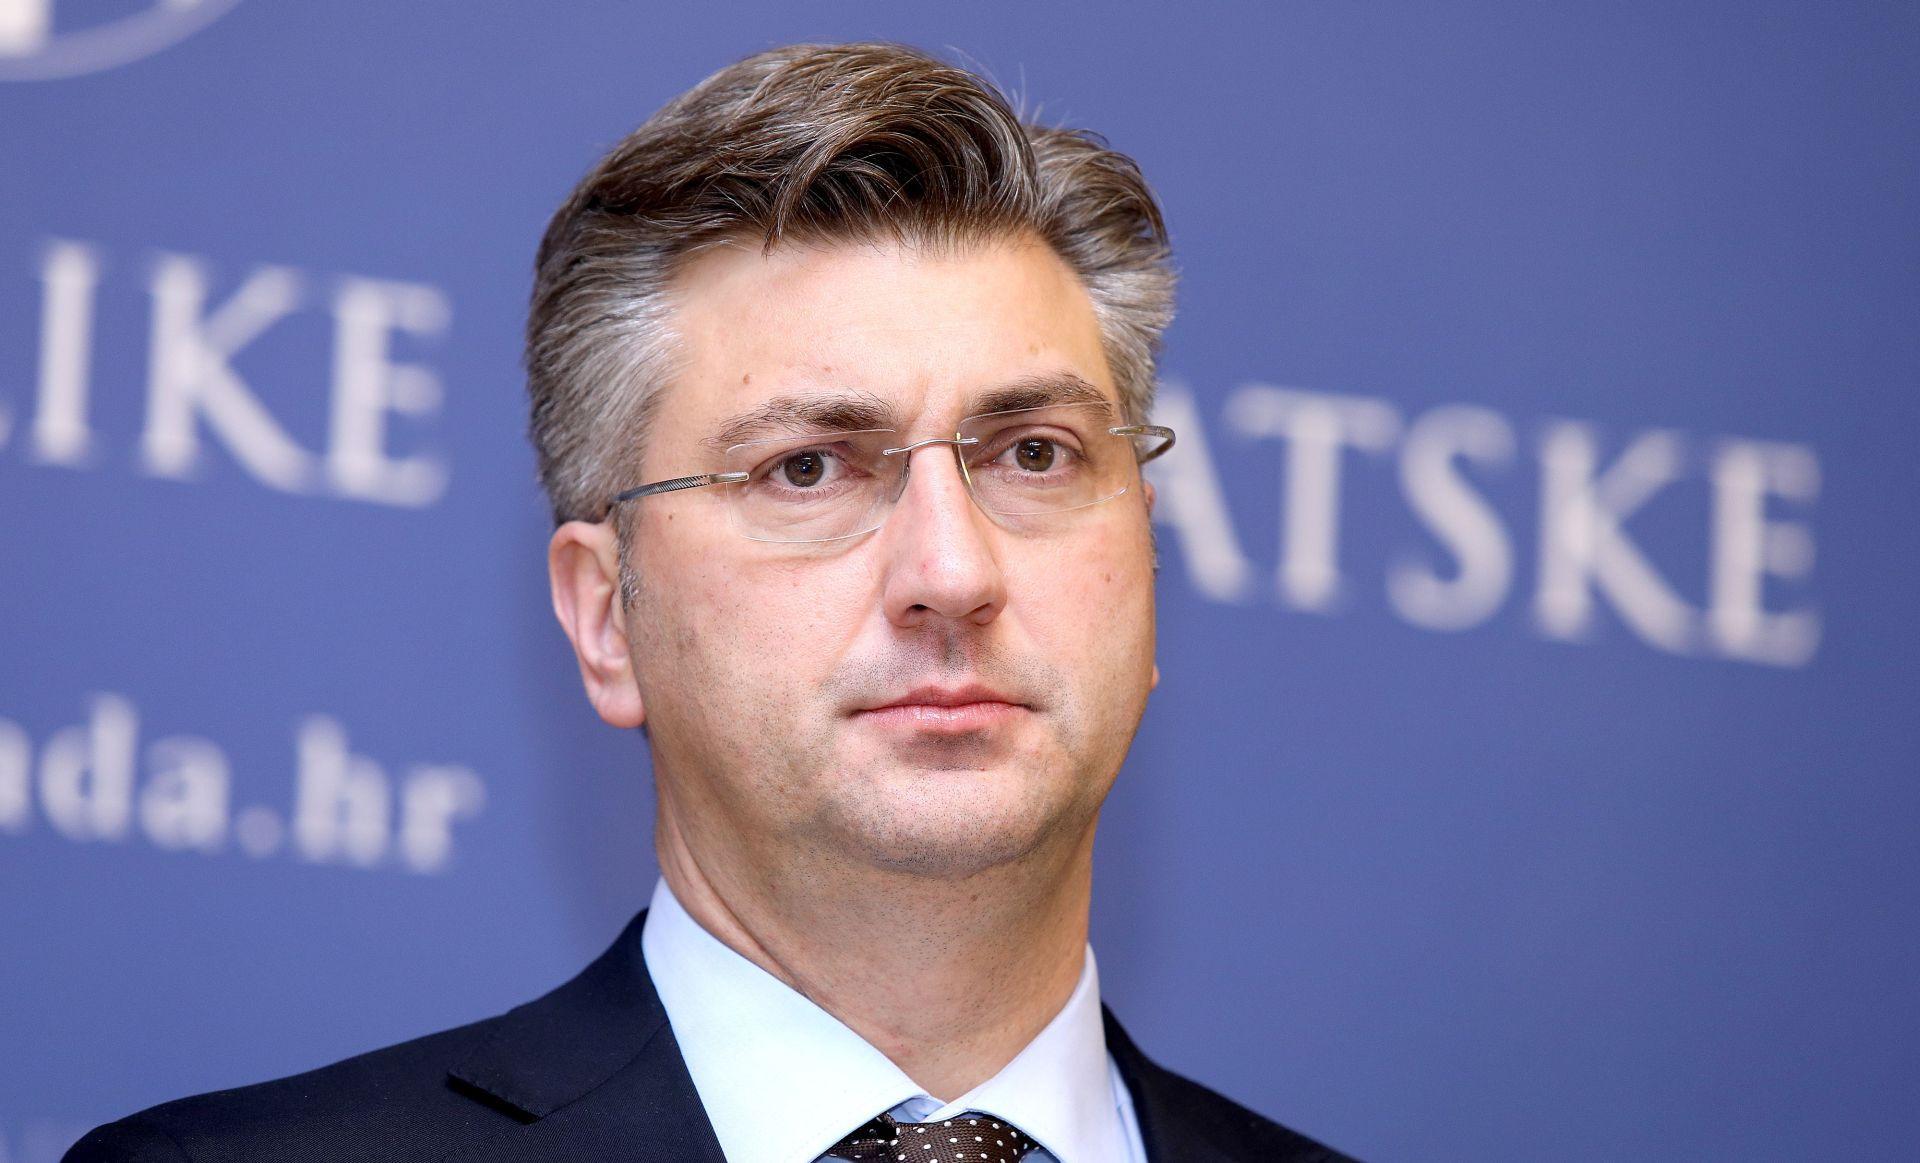 Plenković komentirao Vučićev poziv u Beograd